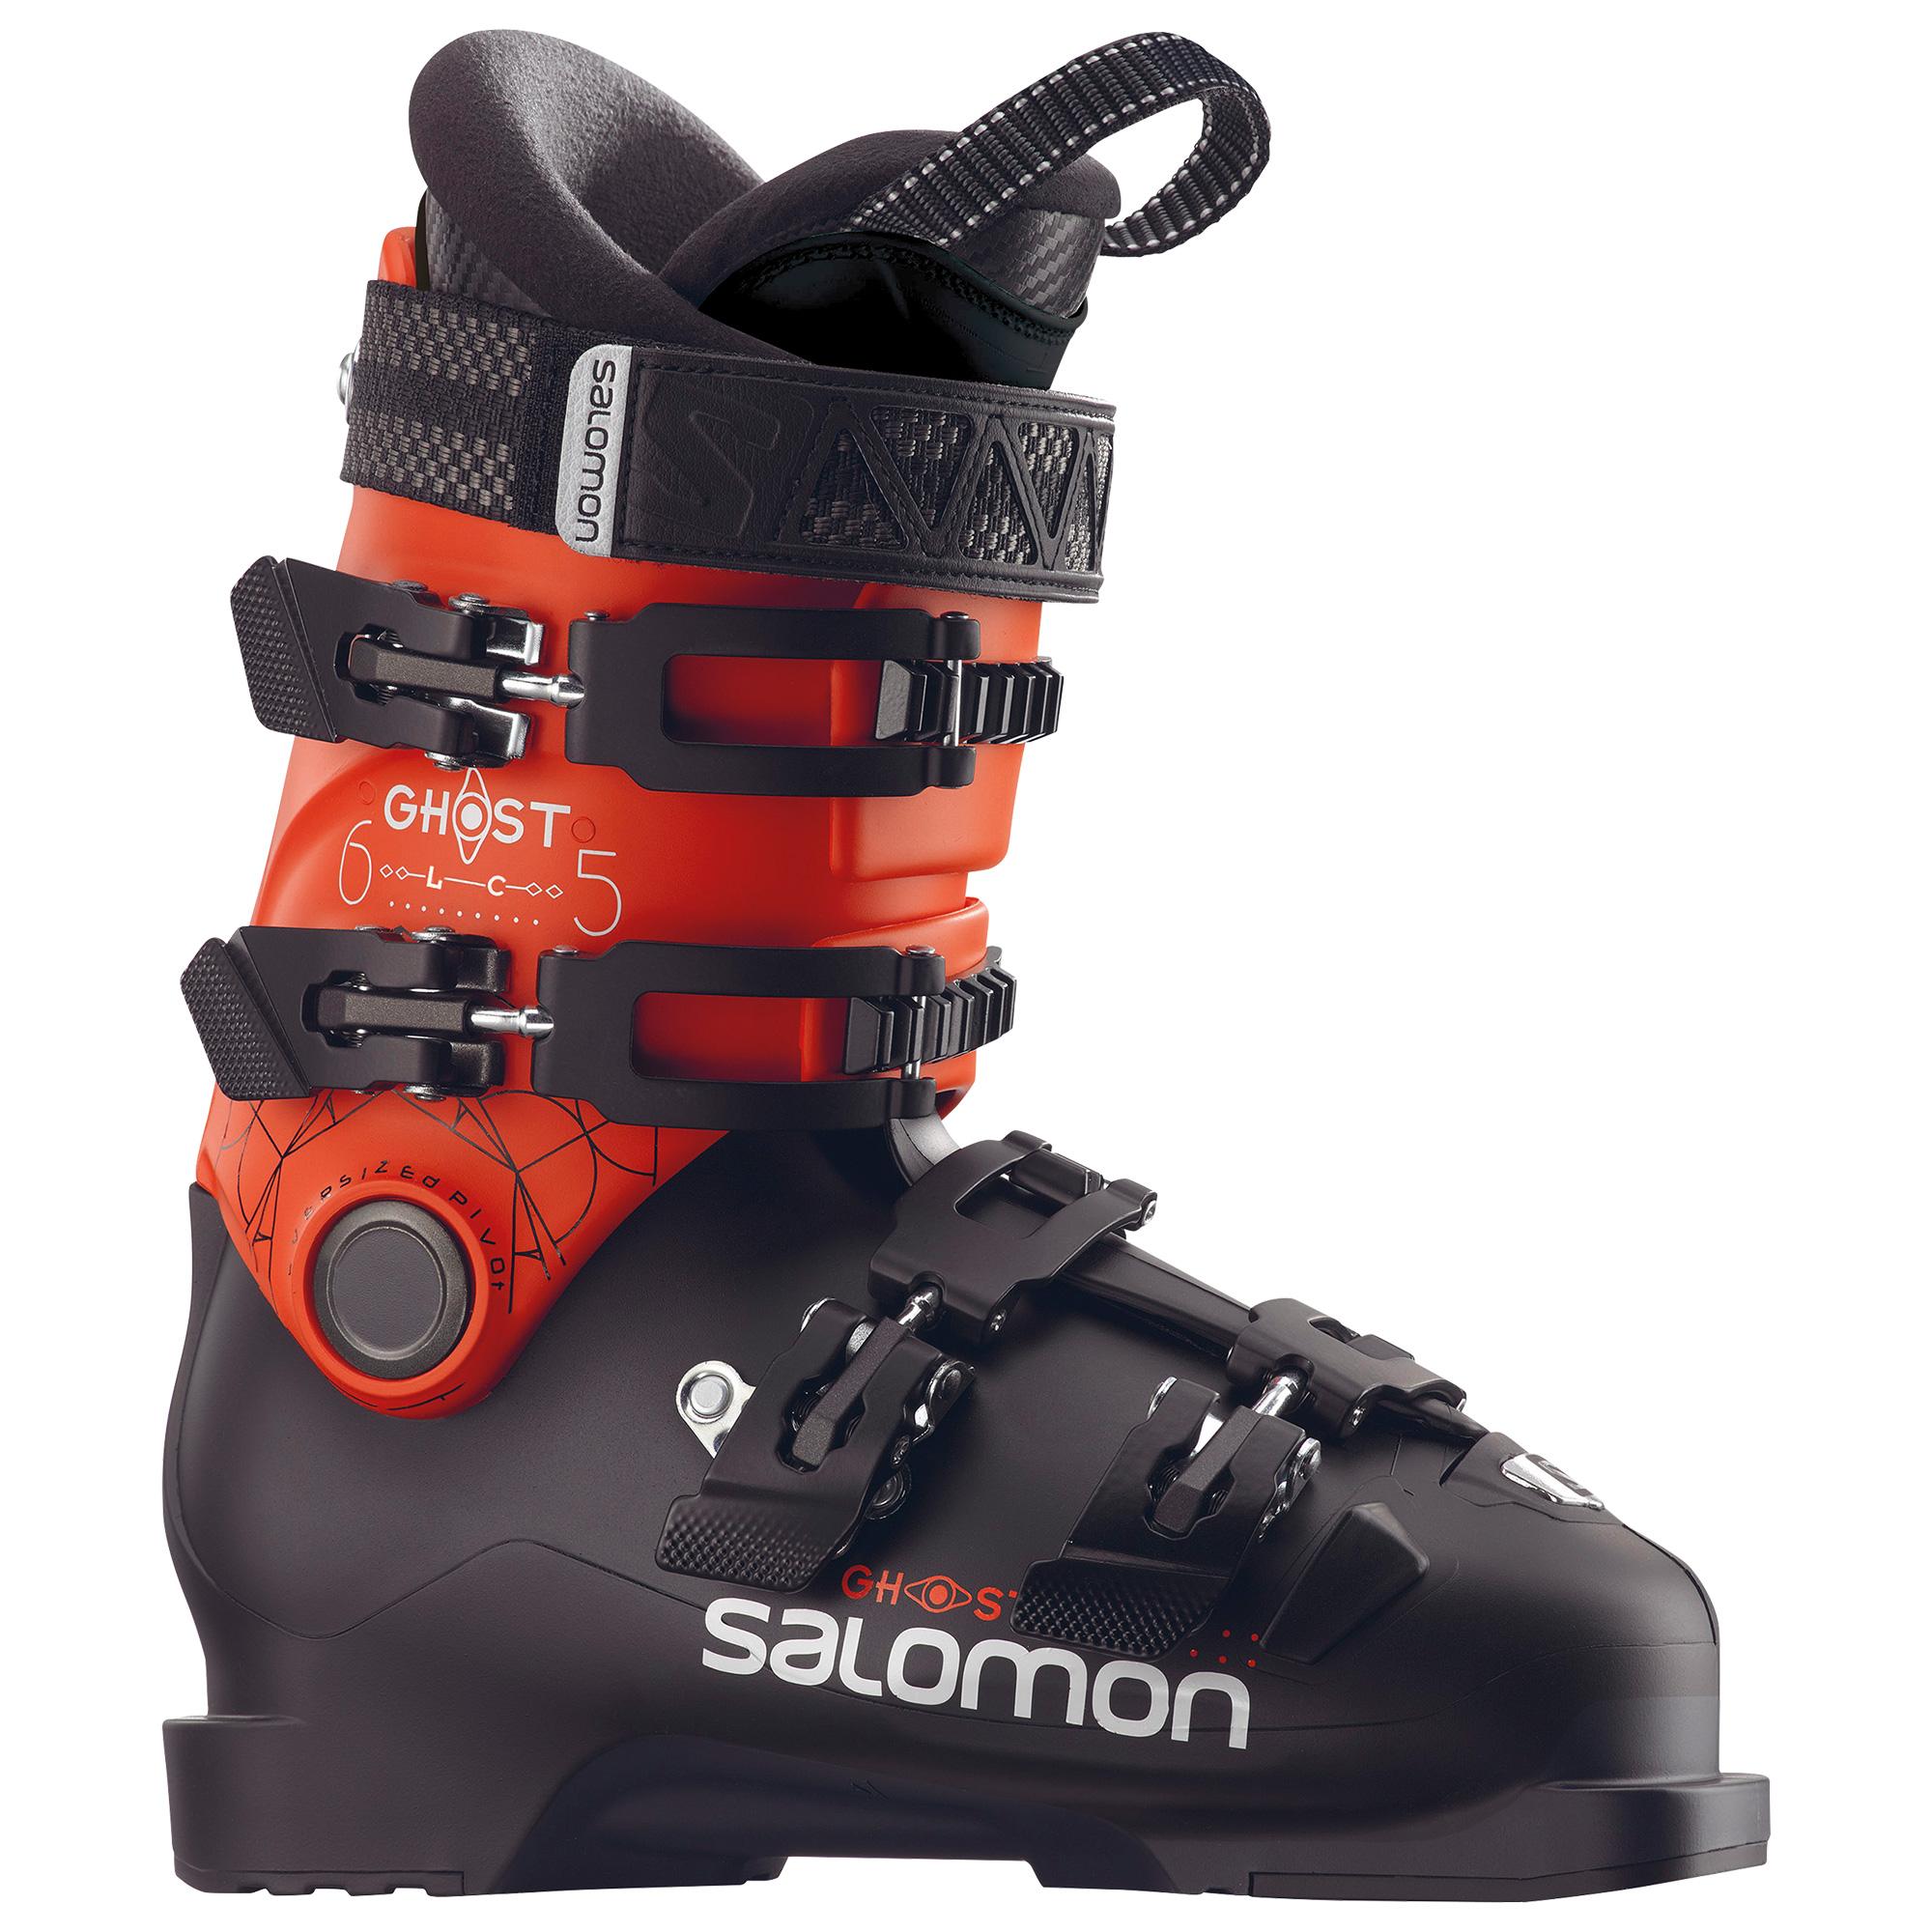 SALOMON GHOST LC 65 buty narciarskie R. 23,5 cm :: Sklep